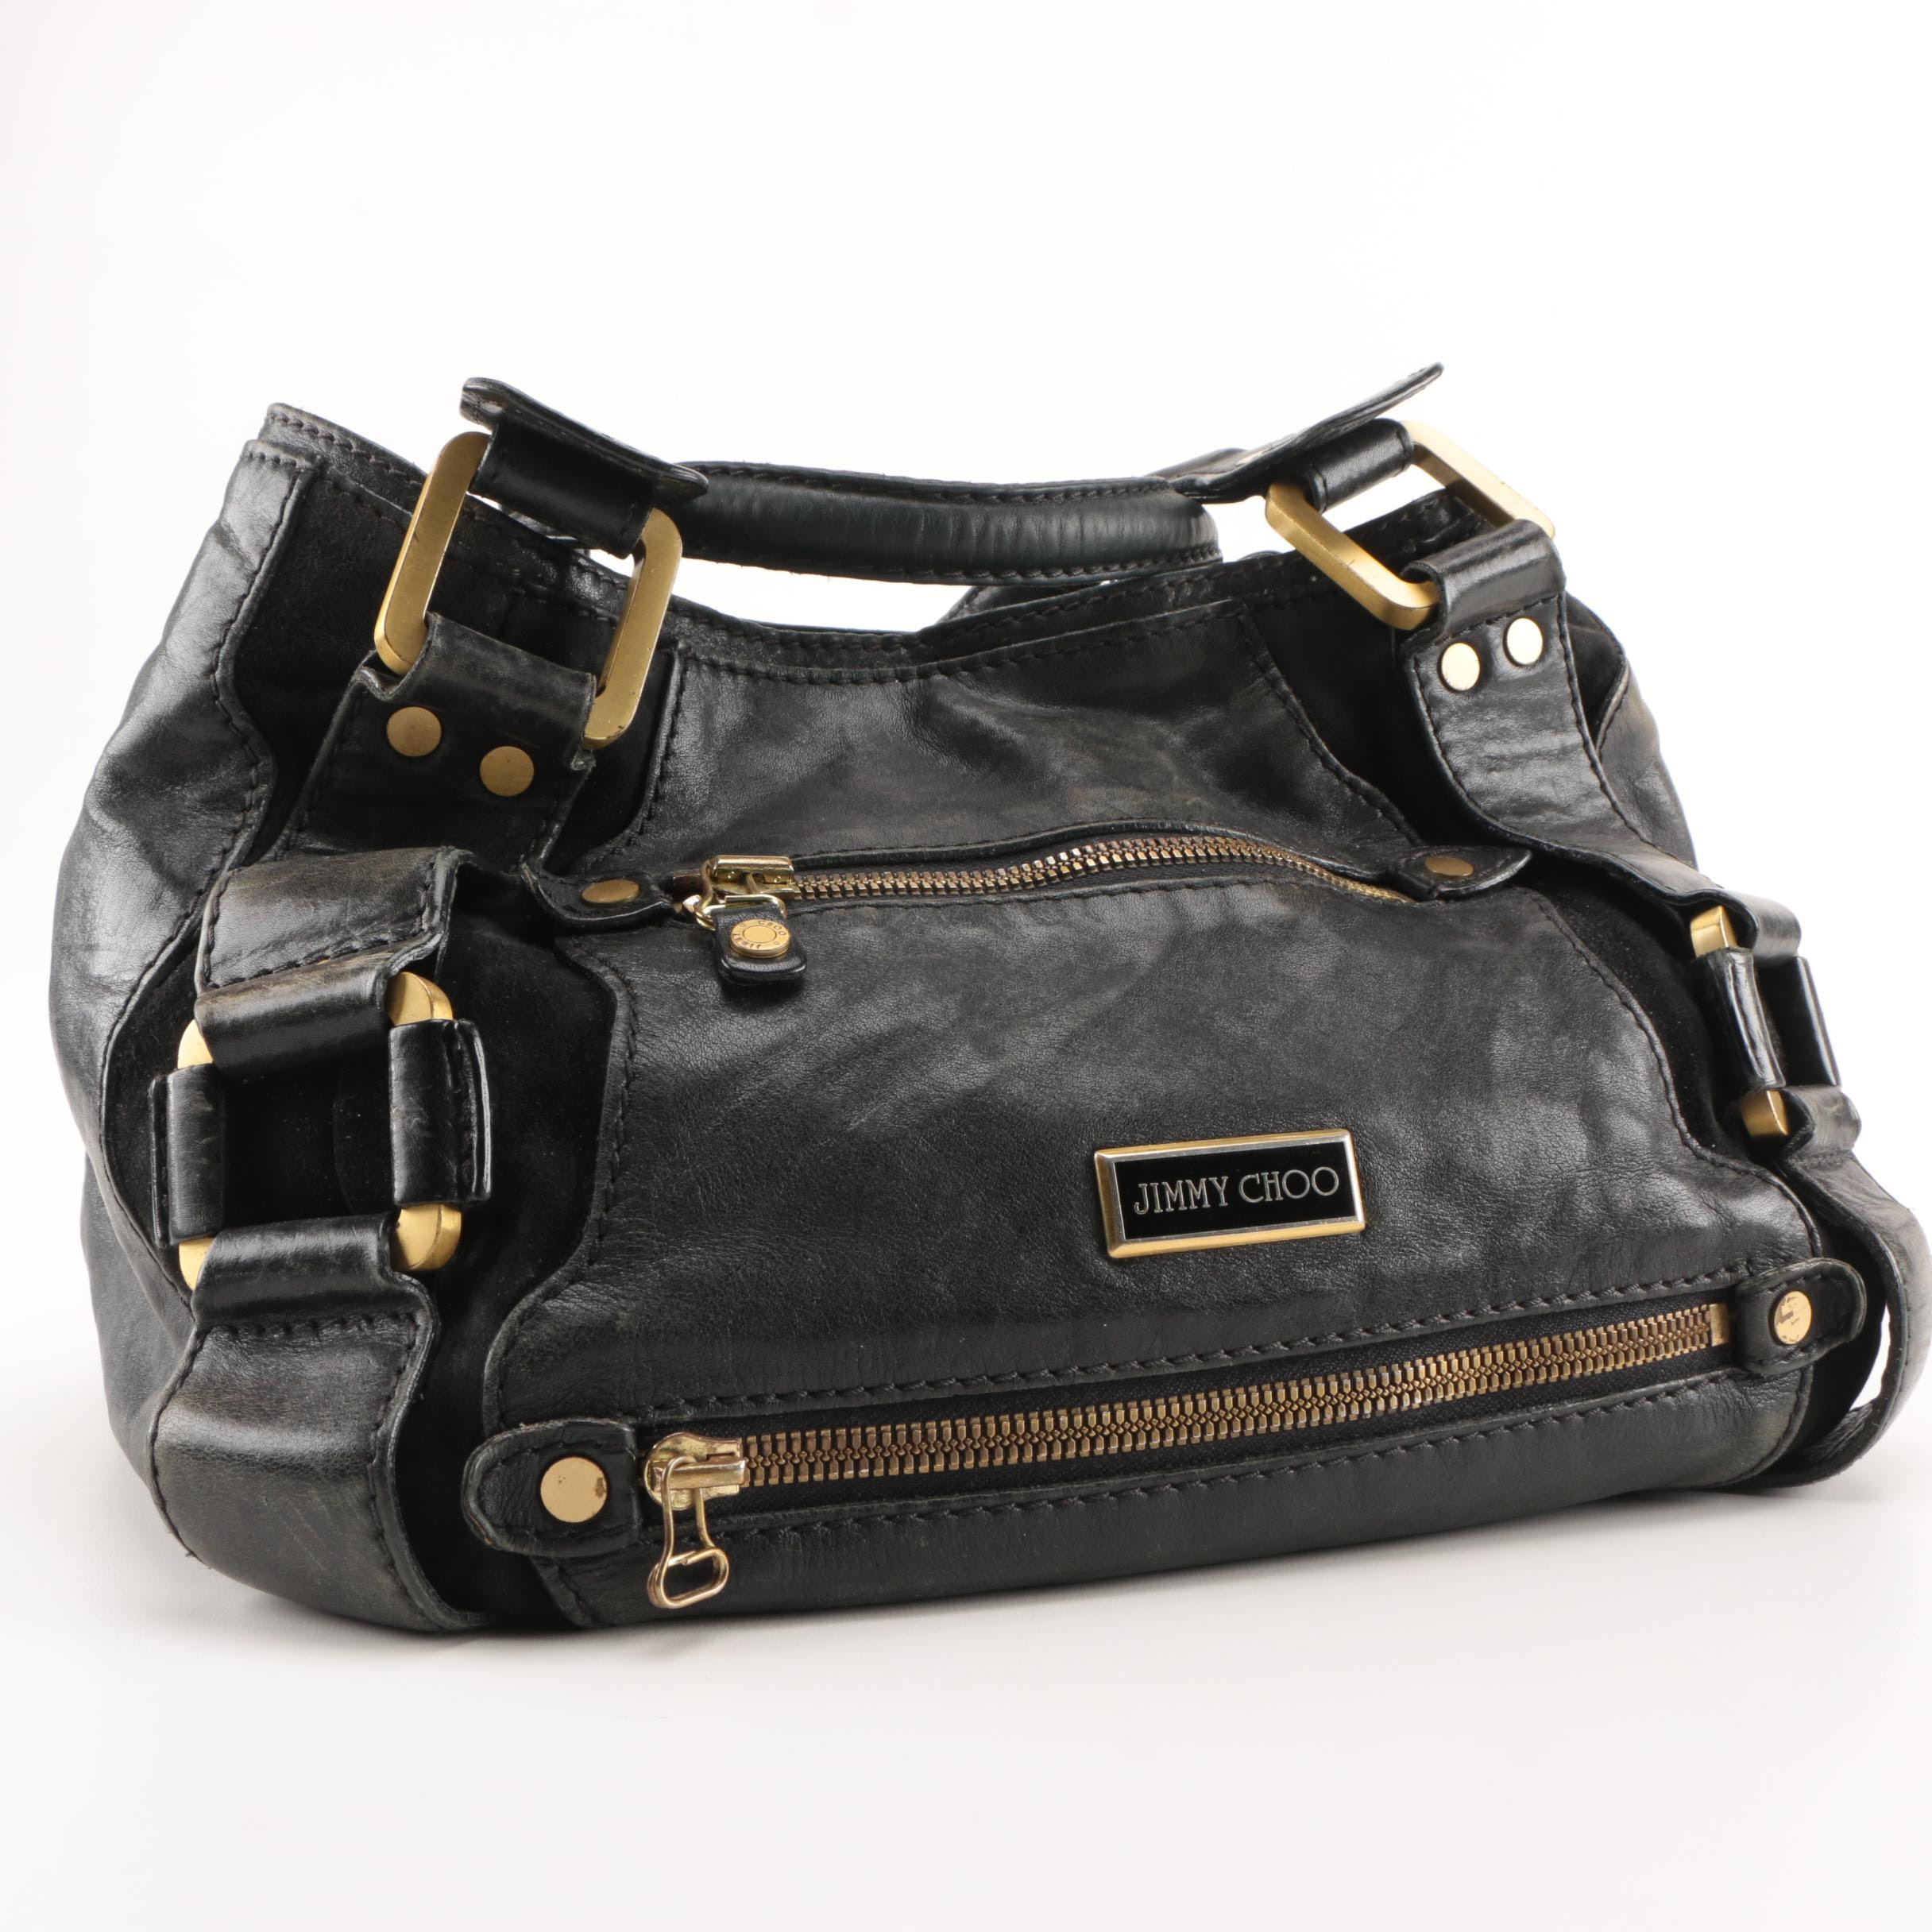 Jimmy Choo Black Leather Mahala Handbag